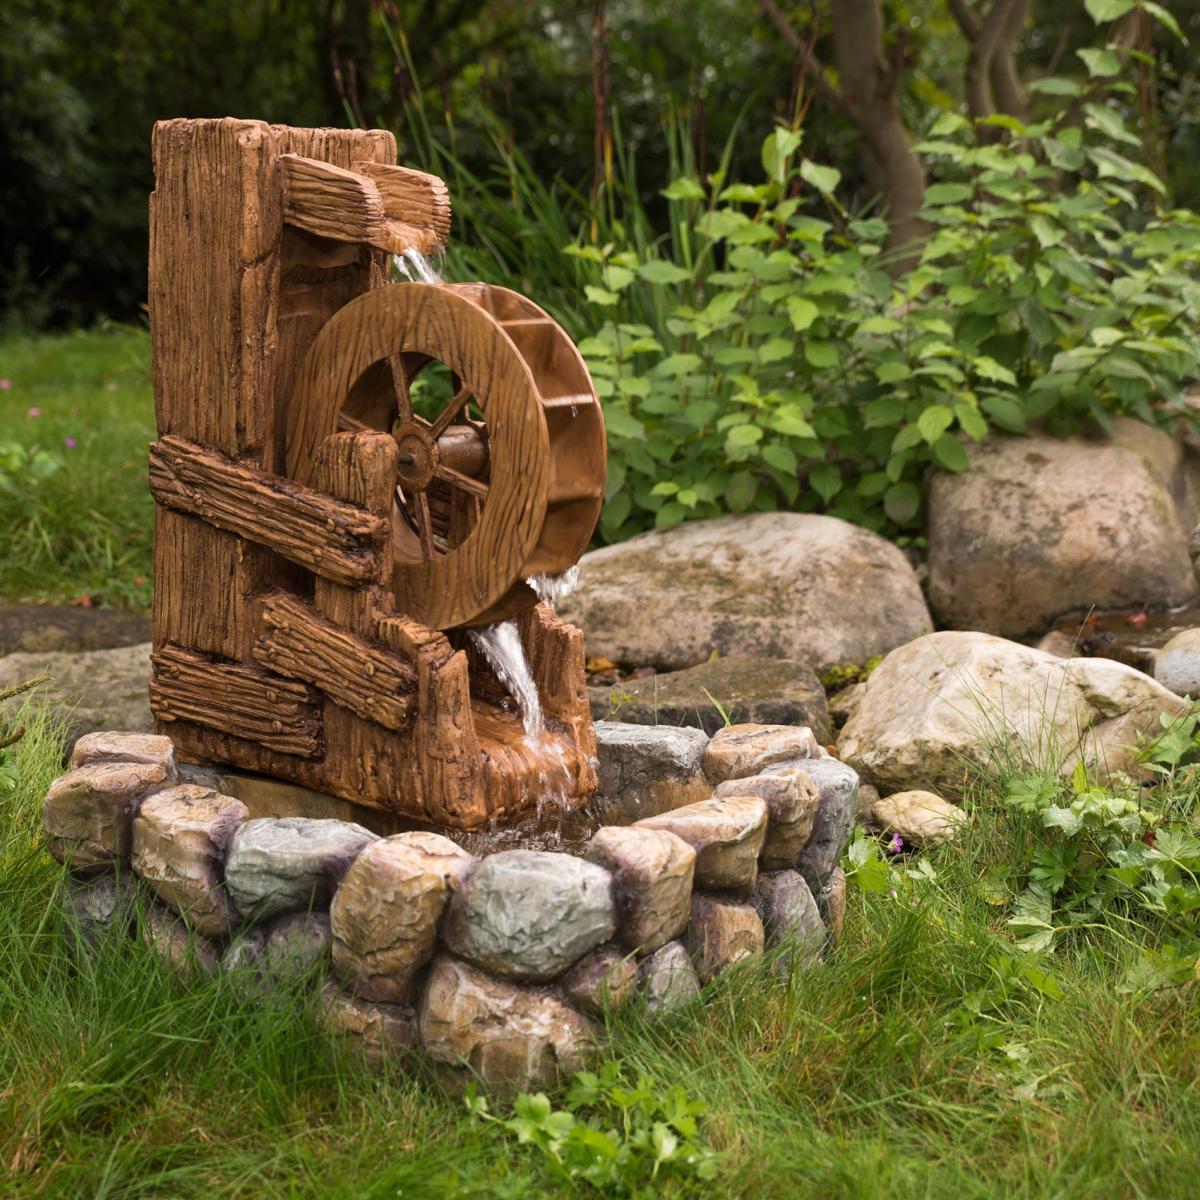 Photo Fontaine De Jardin fontaine de jardin avec roue à aubes